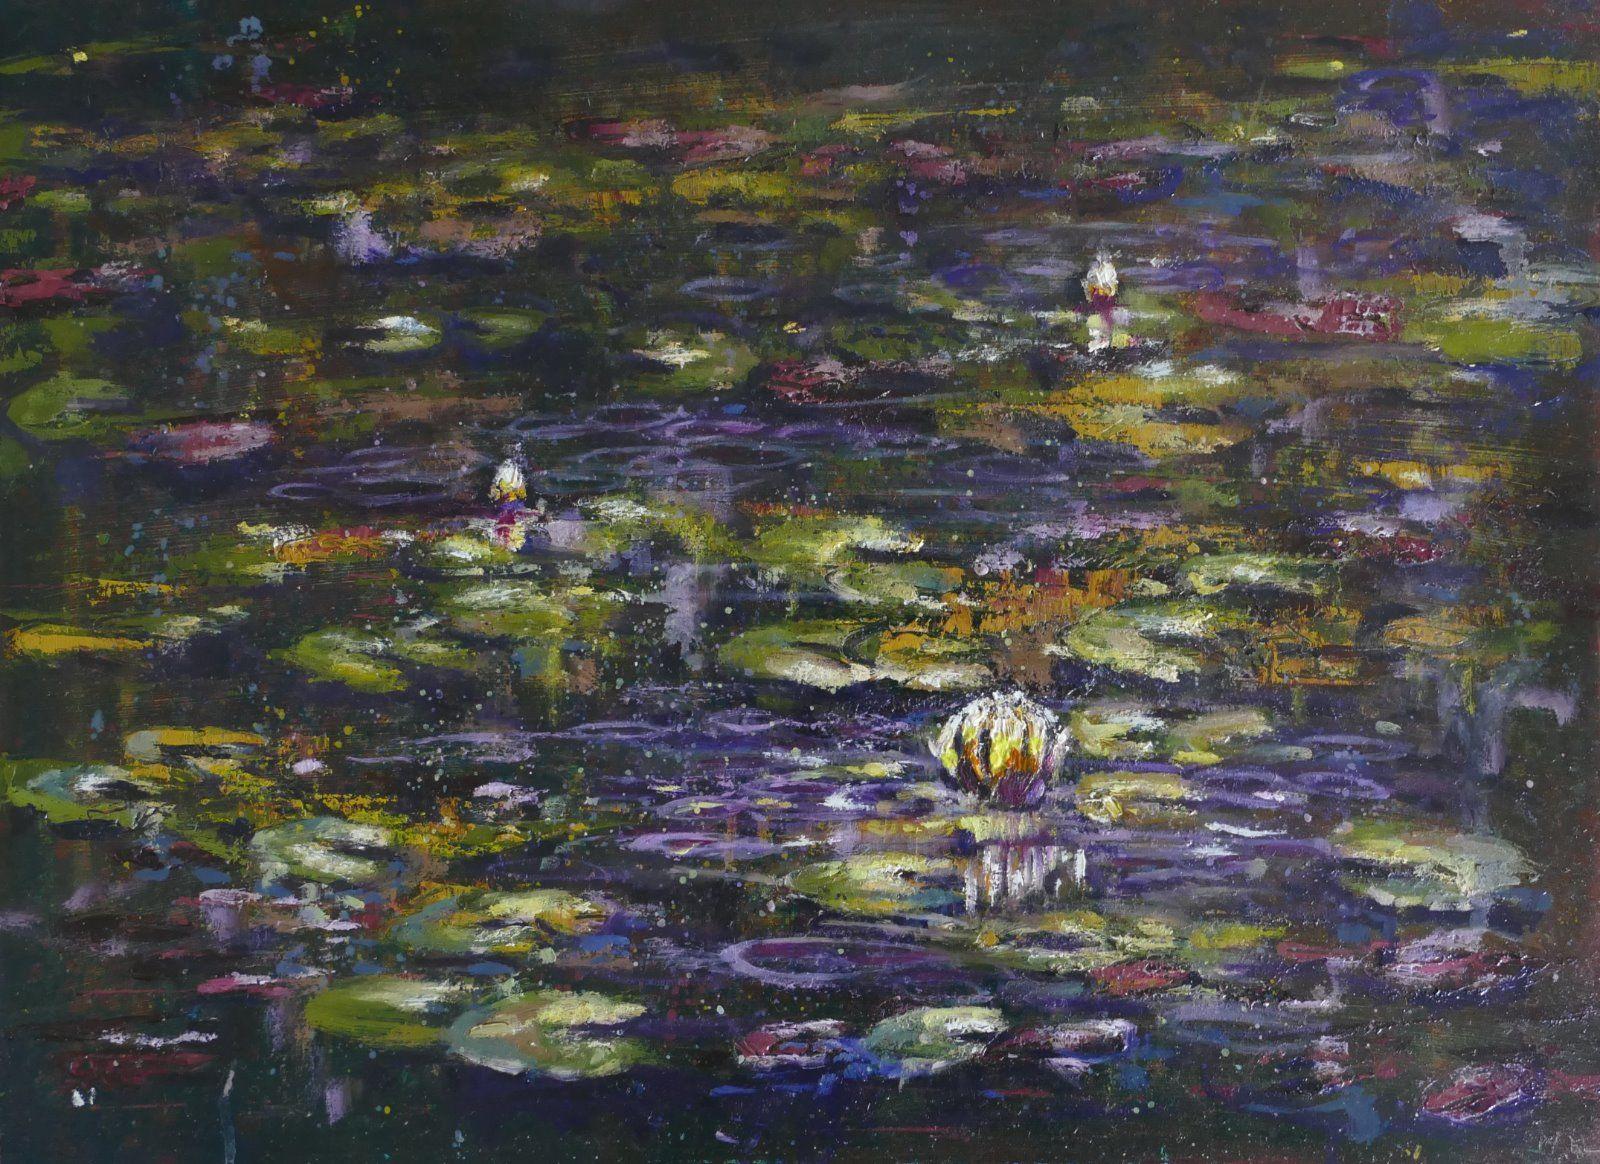 Dark Lily Pond